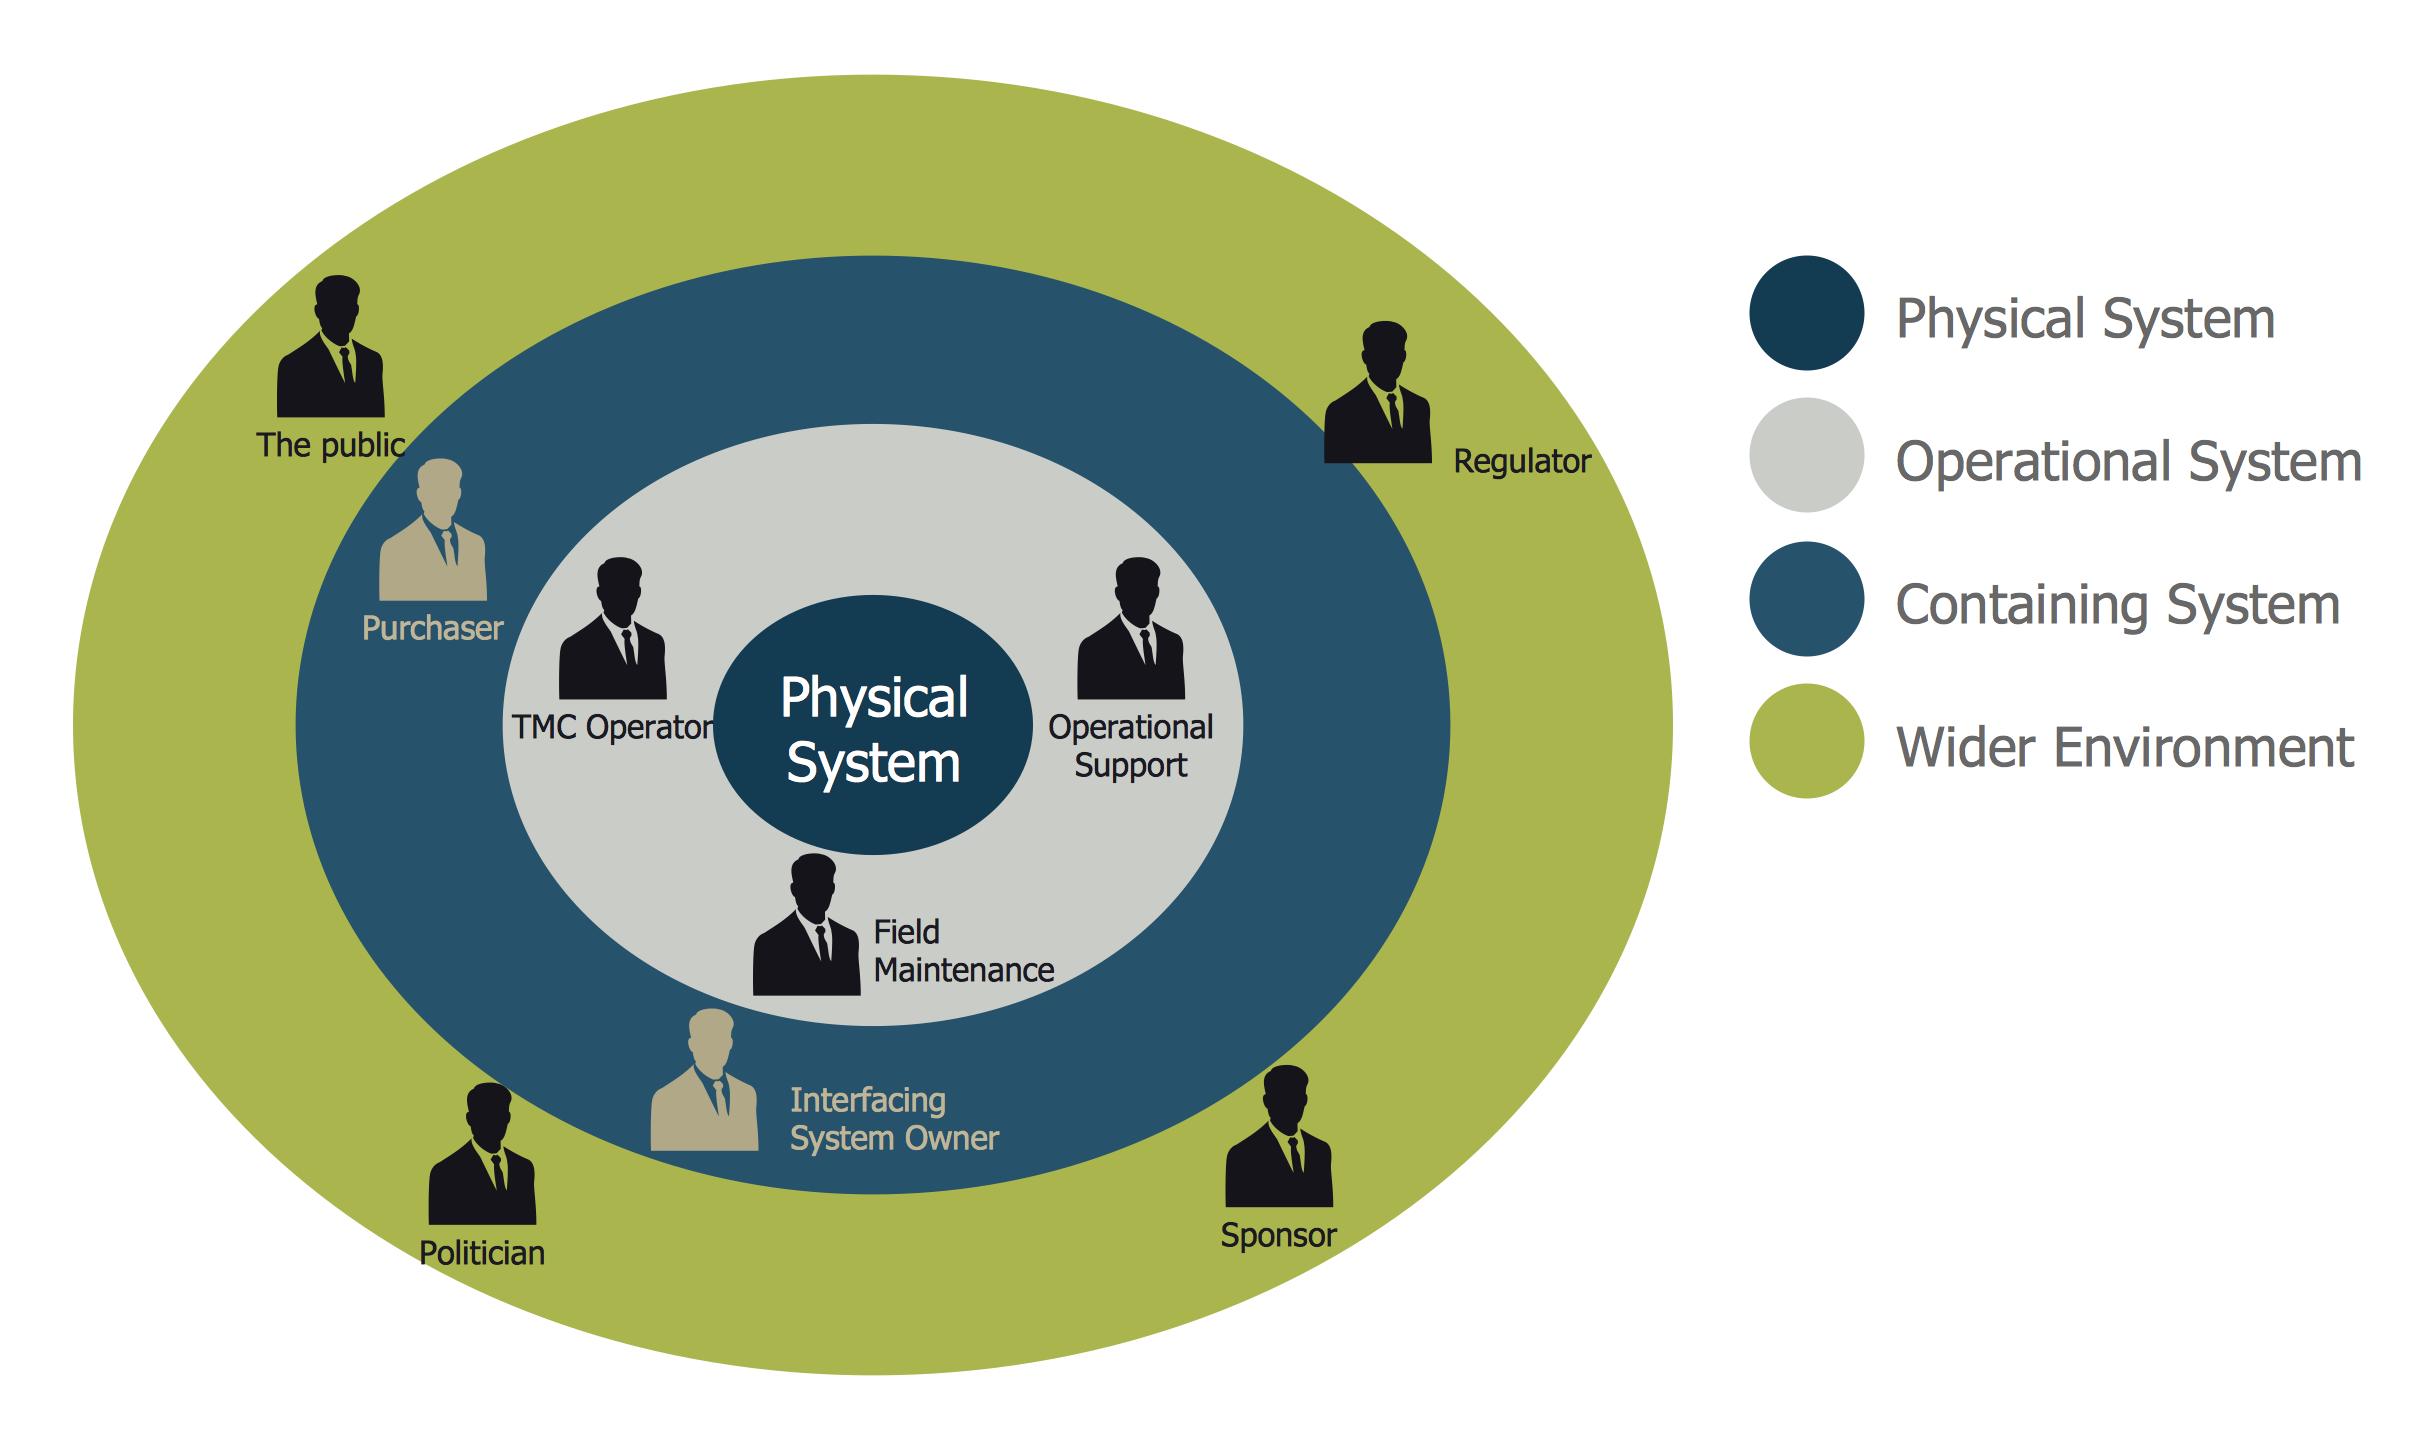 Visualize Stakeholder Analysis